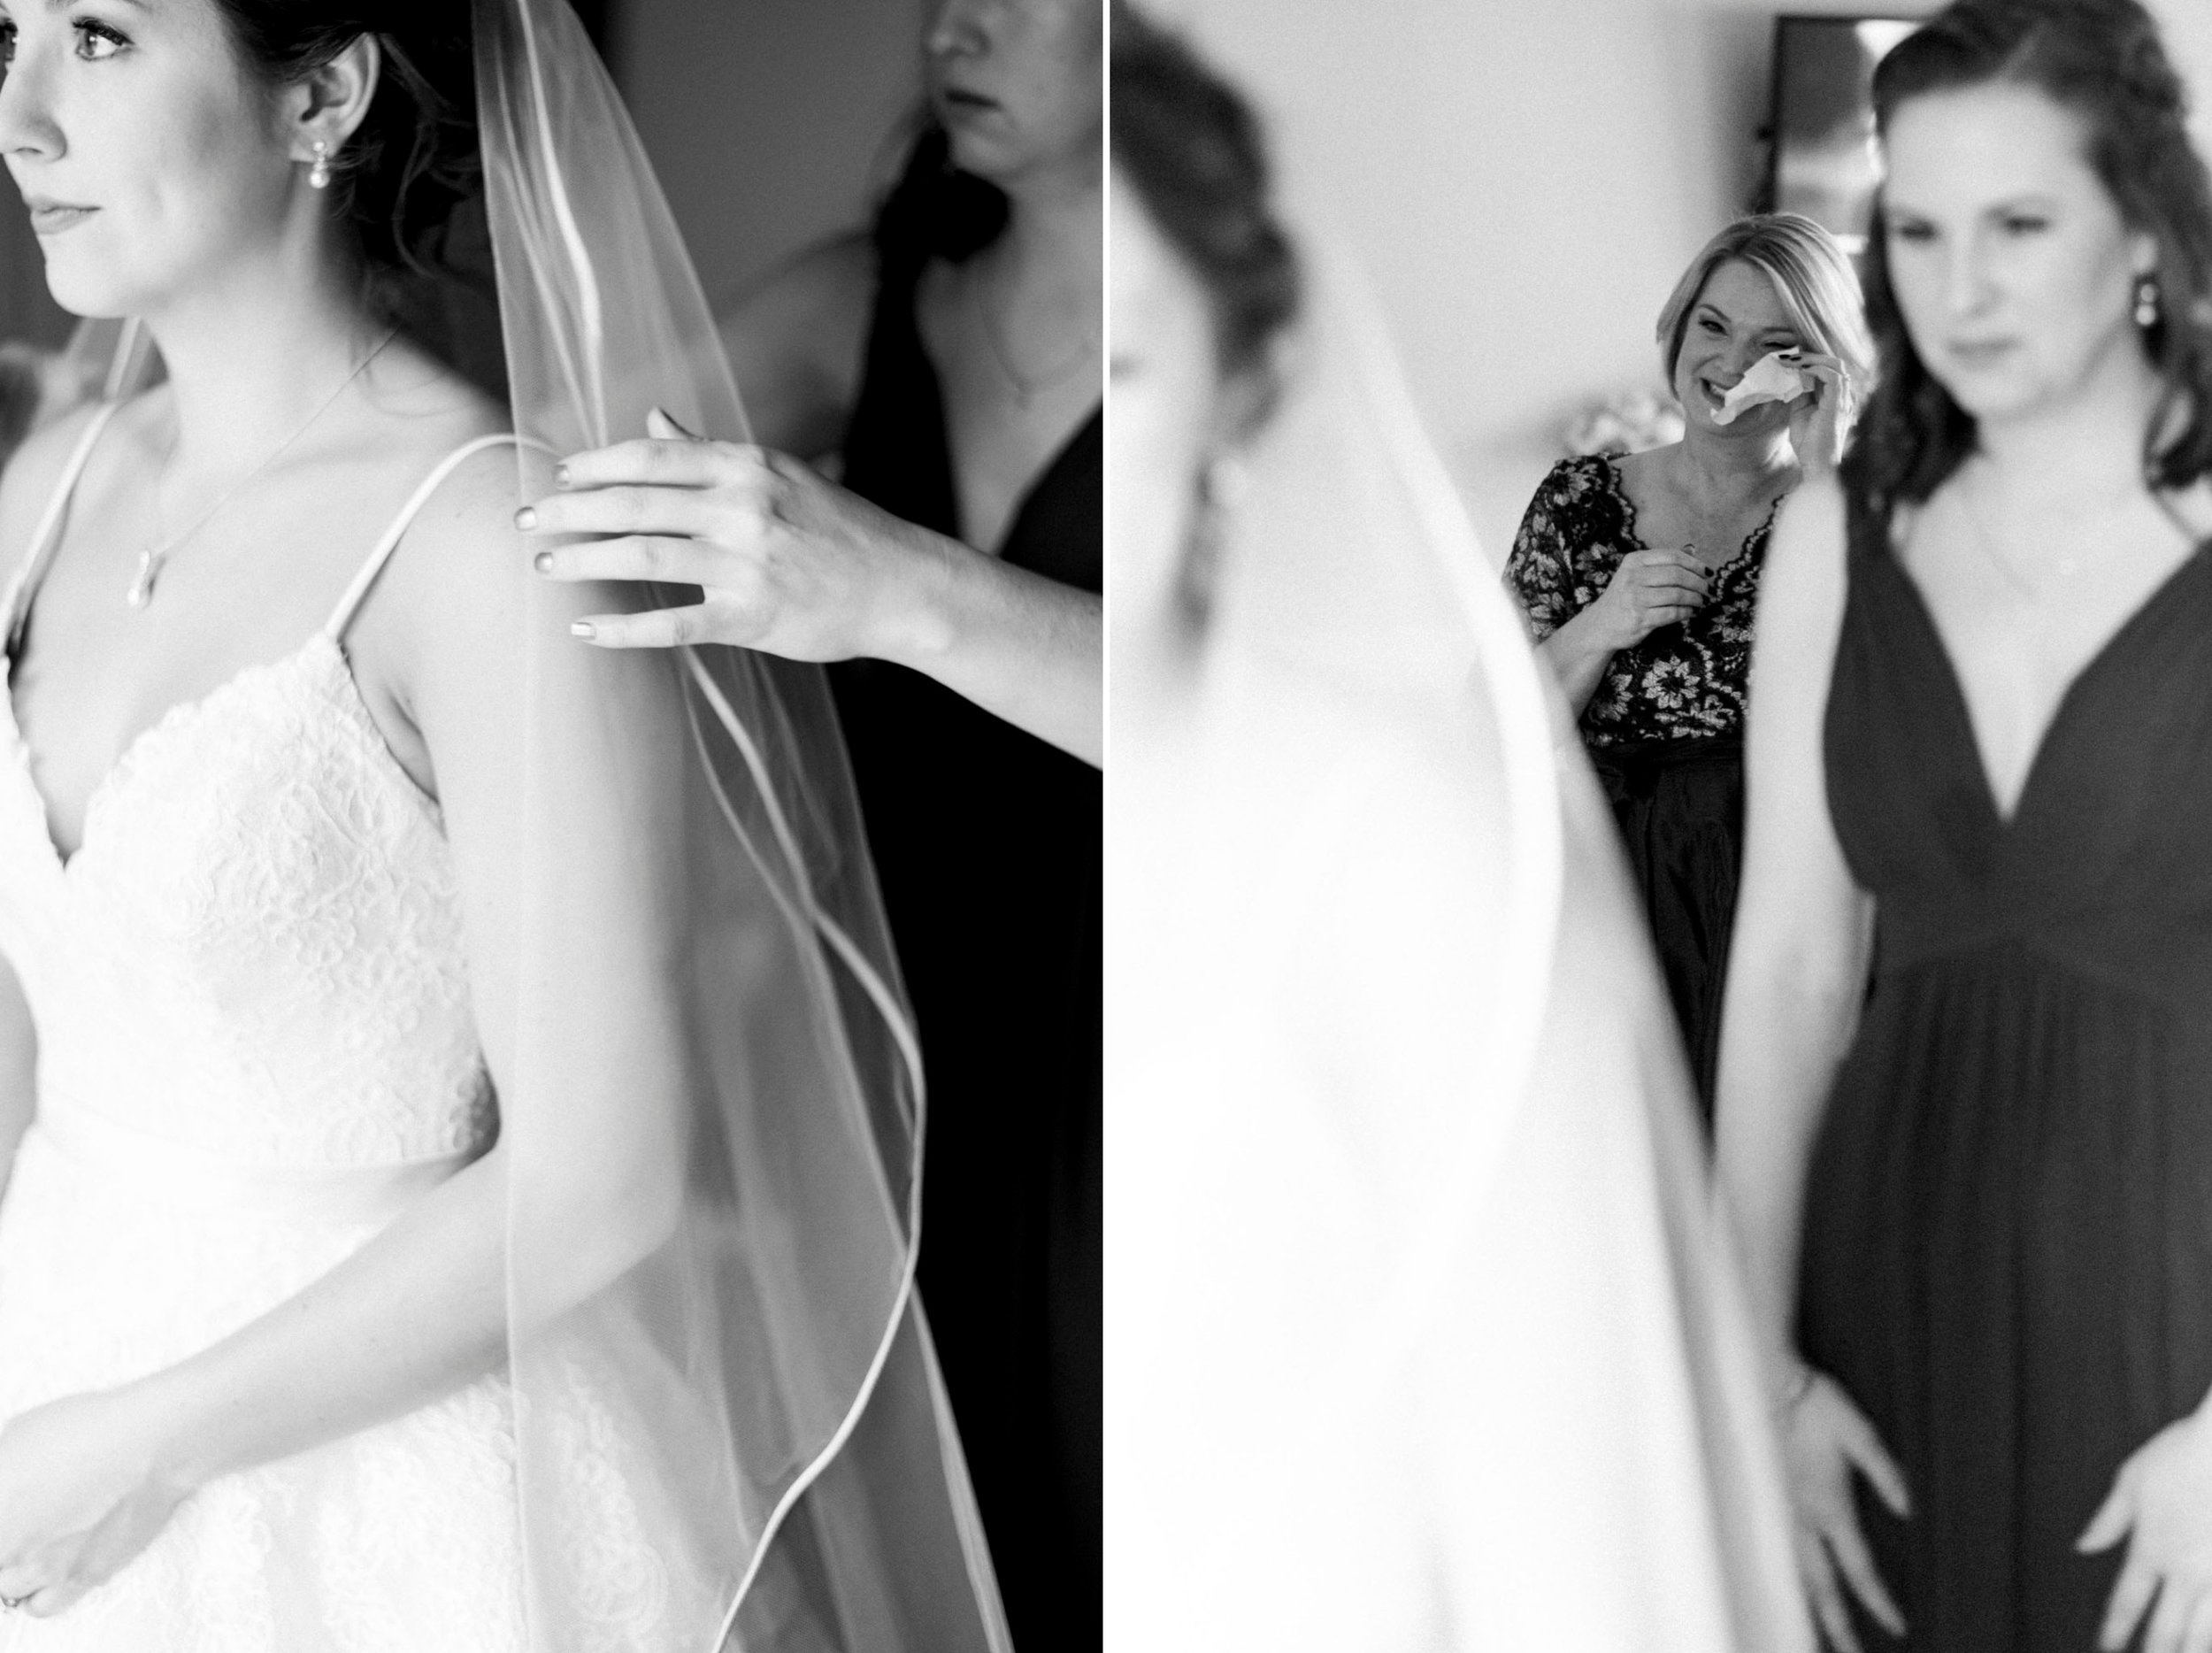 IrvineEstate_LexingtonVA_Wedding_FallWedding_VirginiaWeddingPhotographer 17.jpg